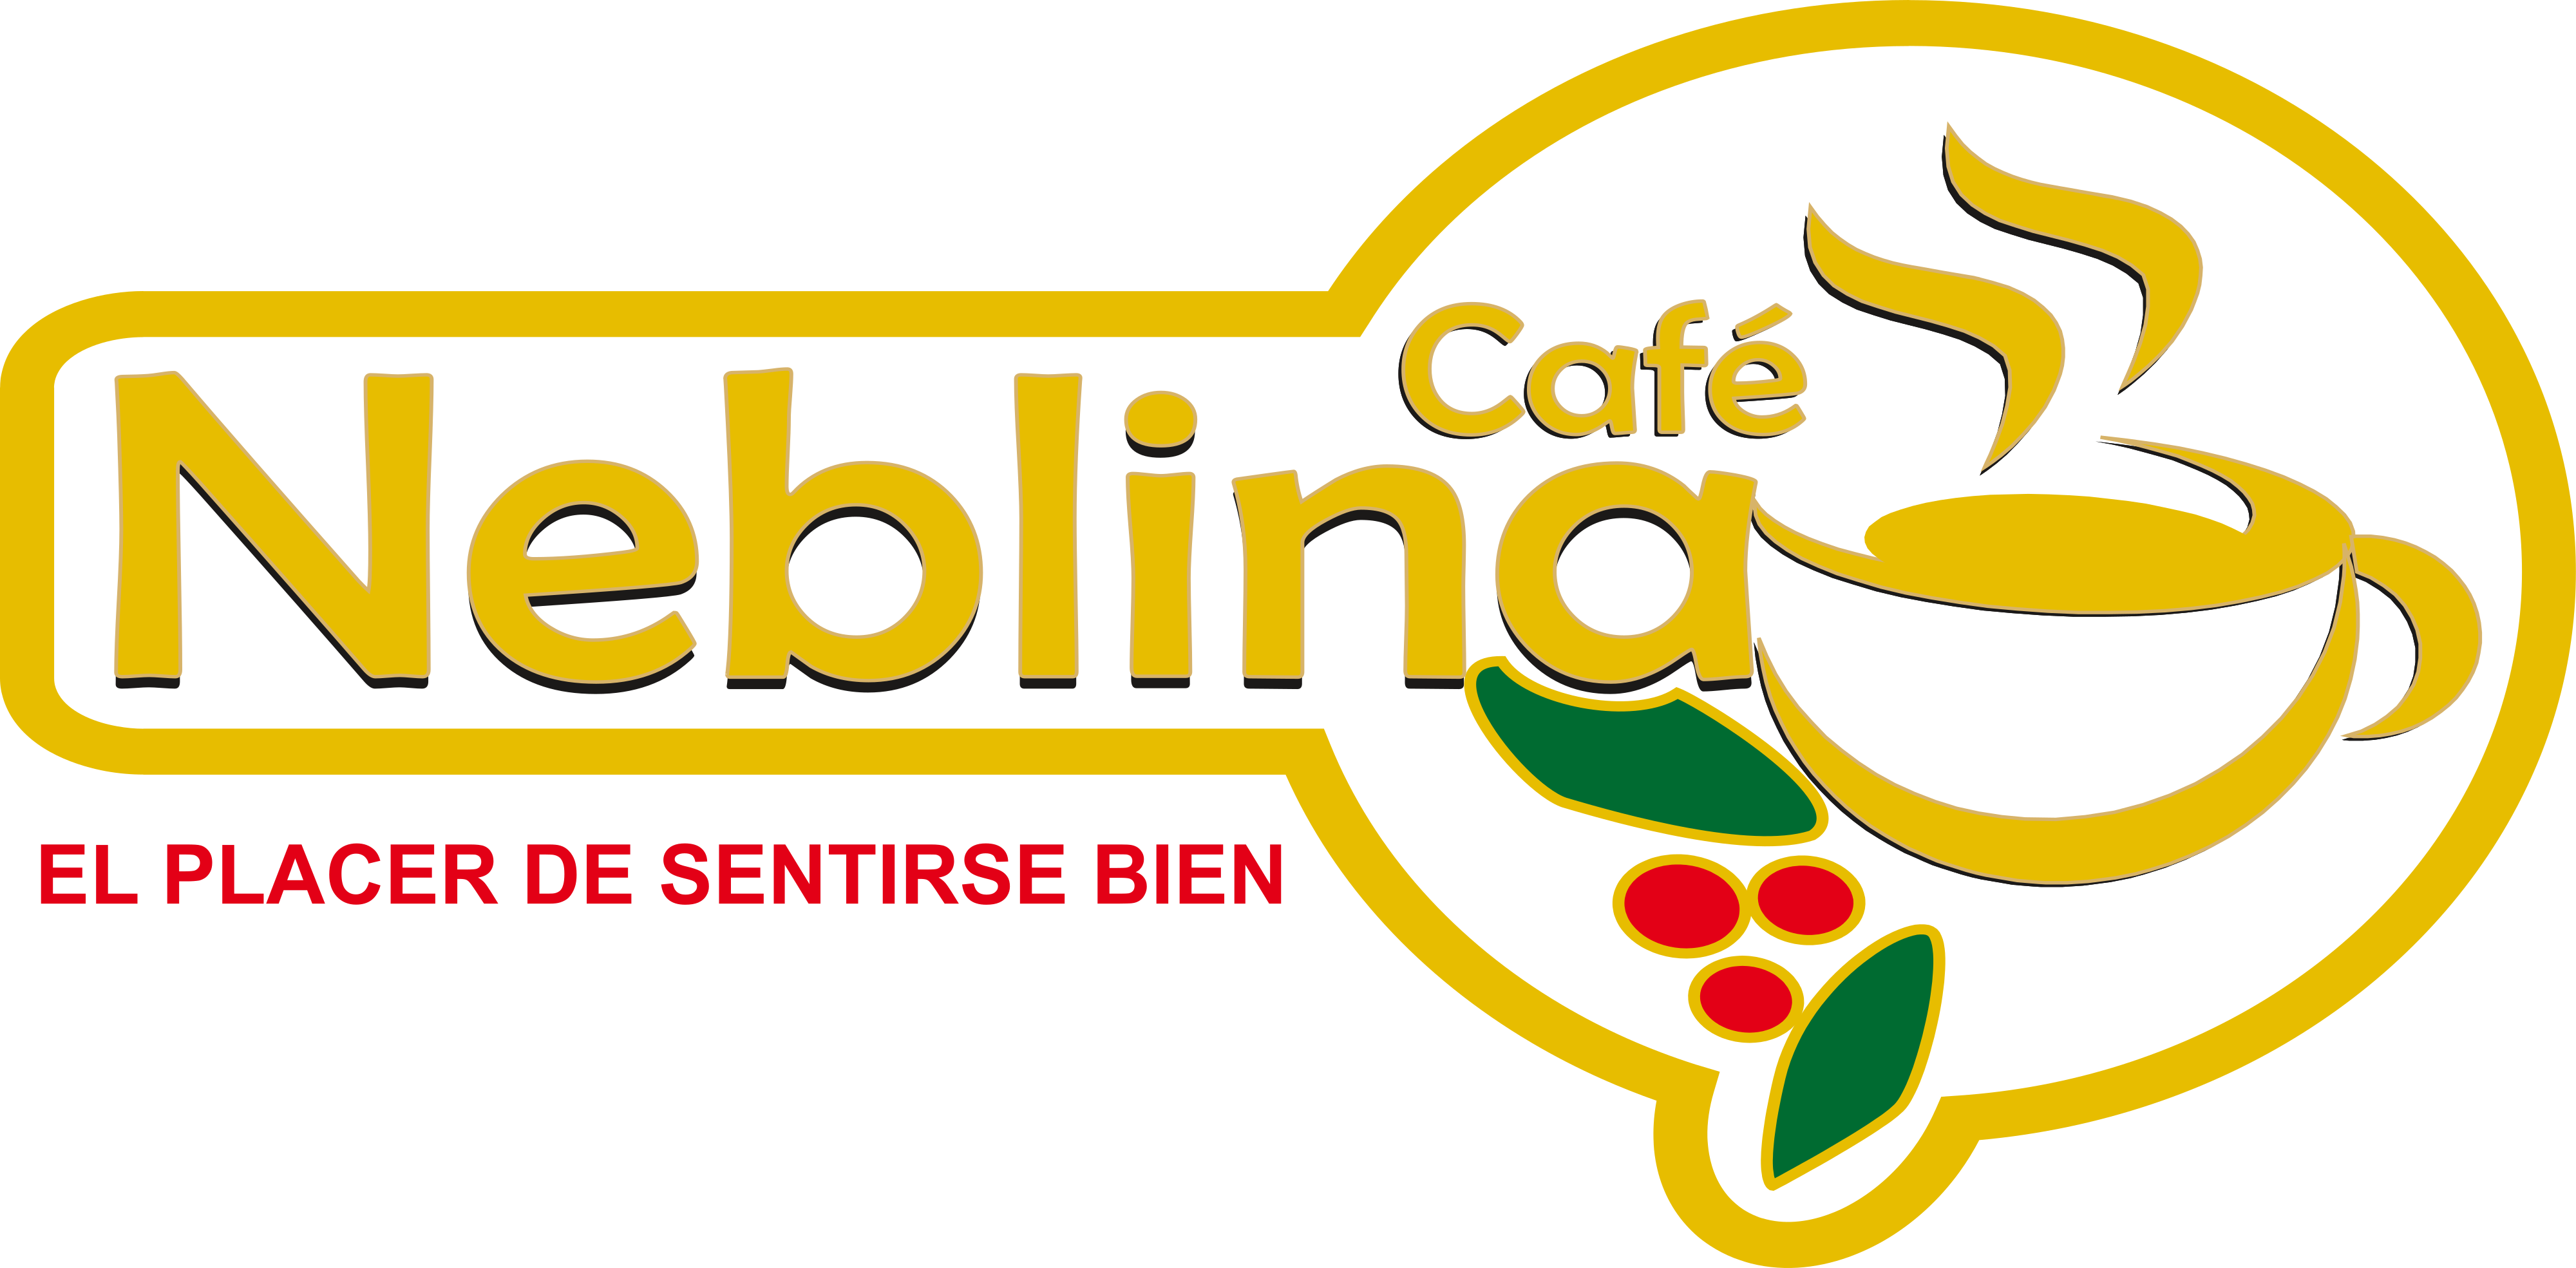 Café Neblina